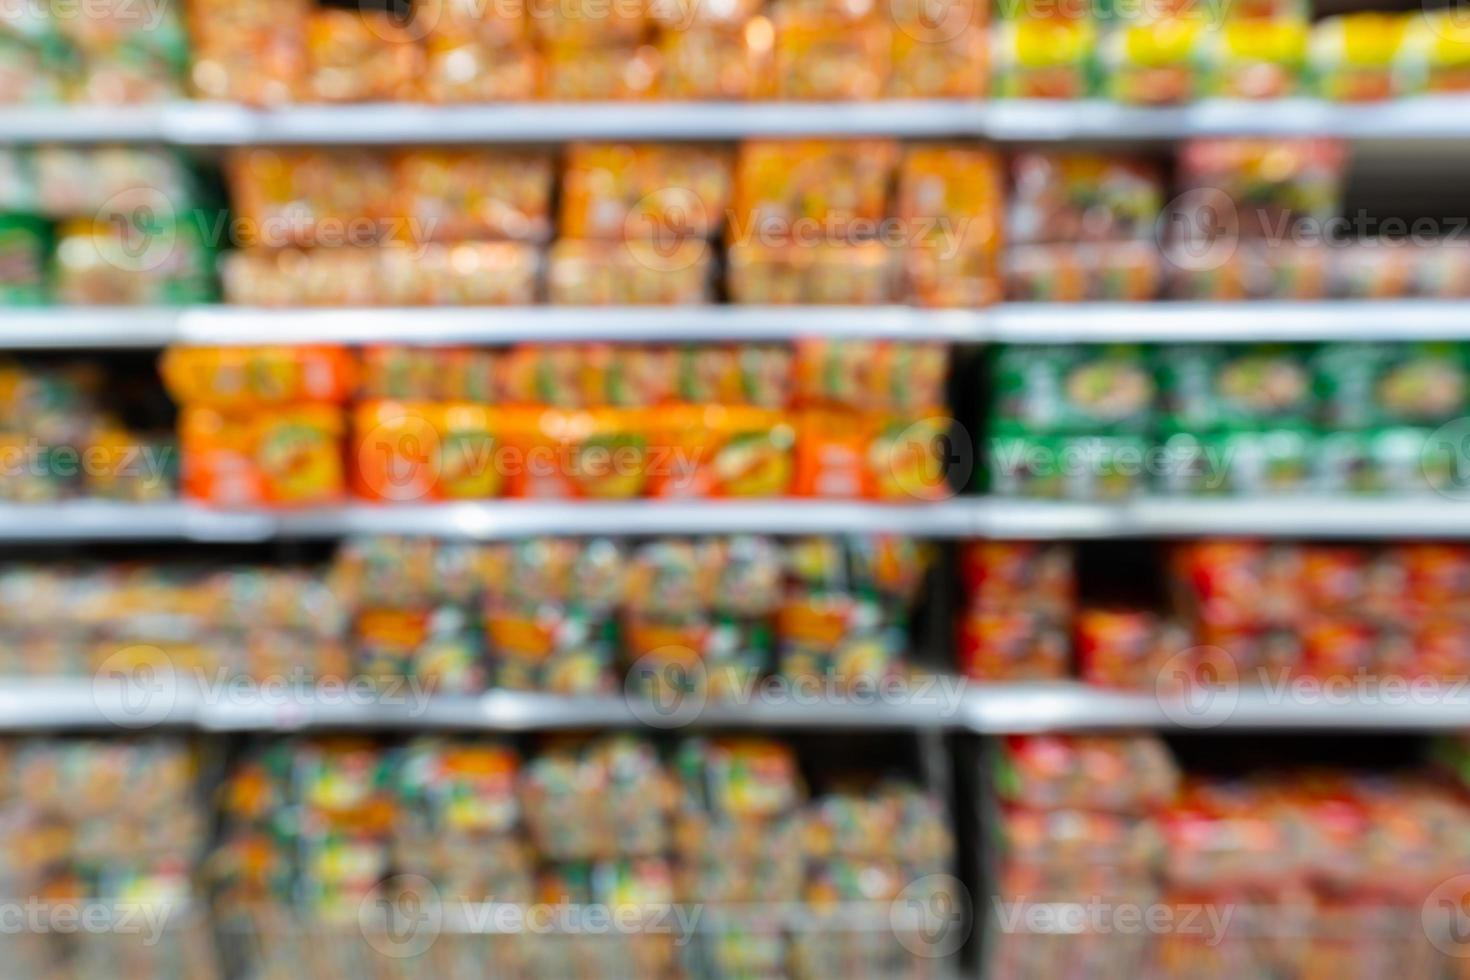 estantes borrosos de la tienda de comestibles foto